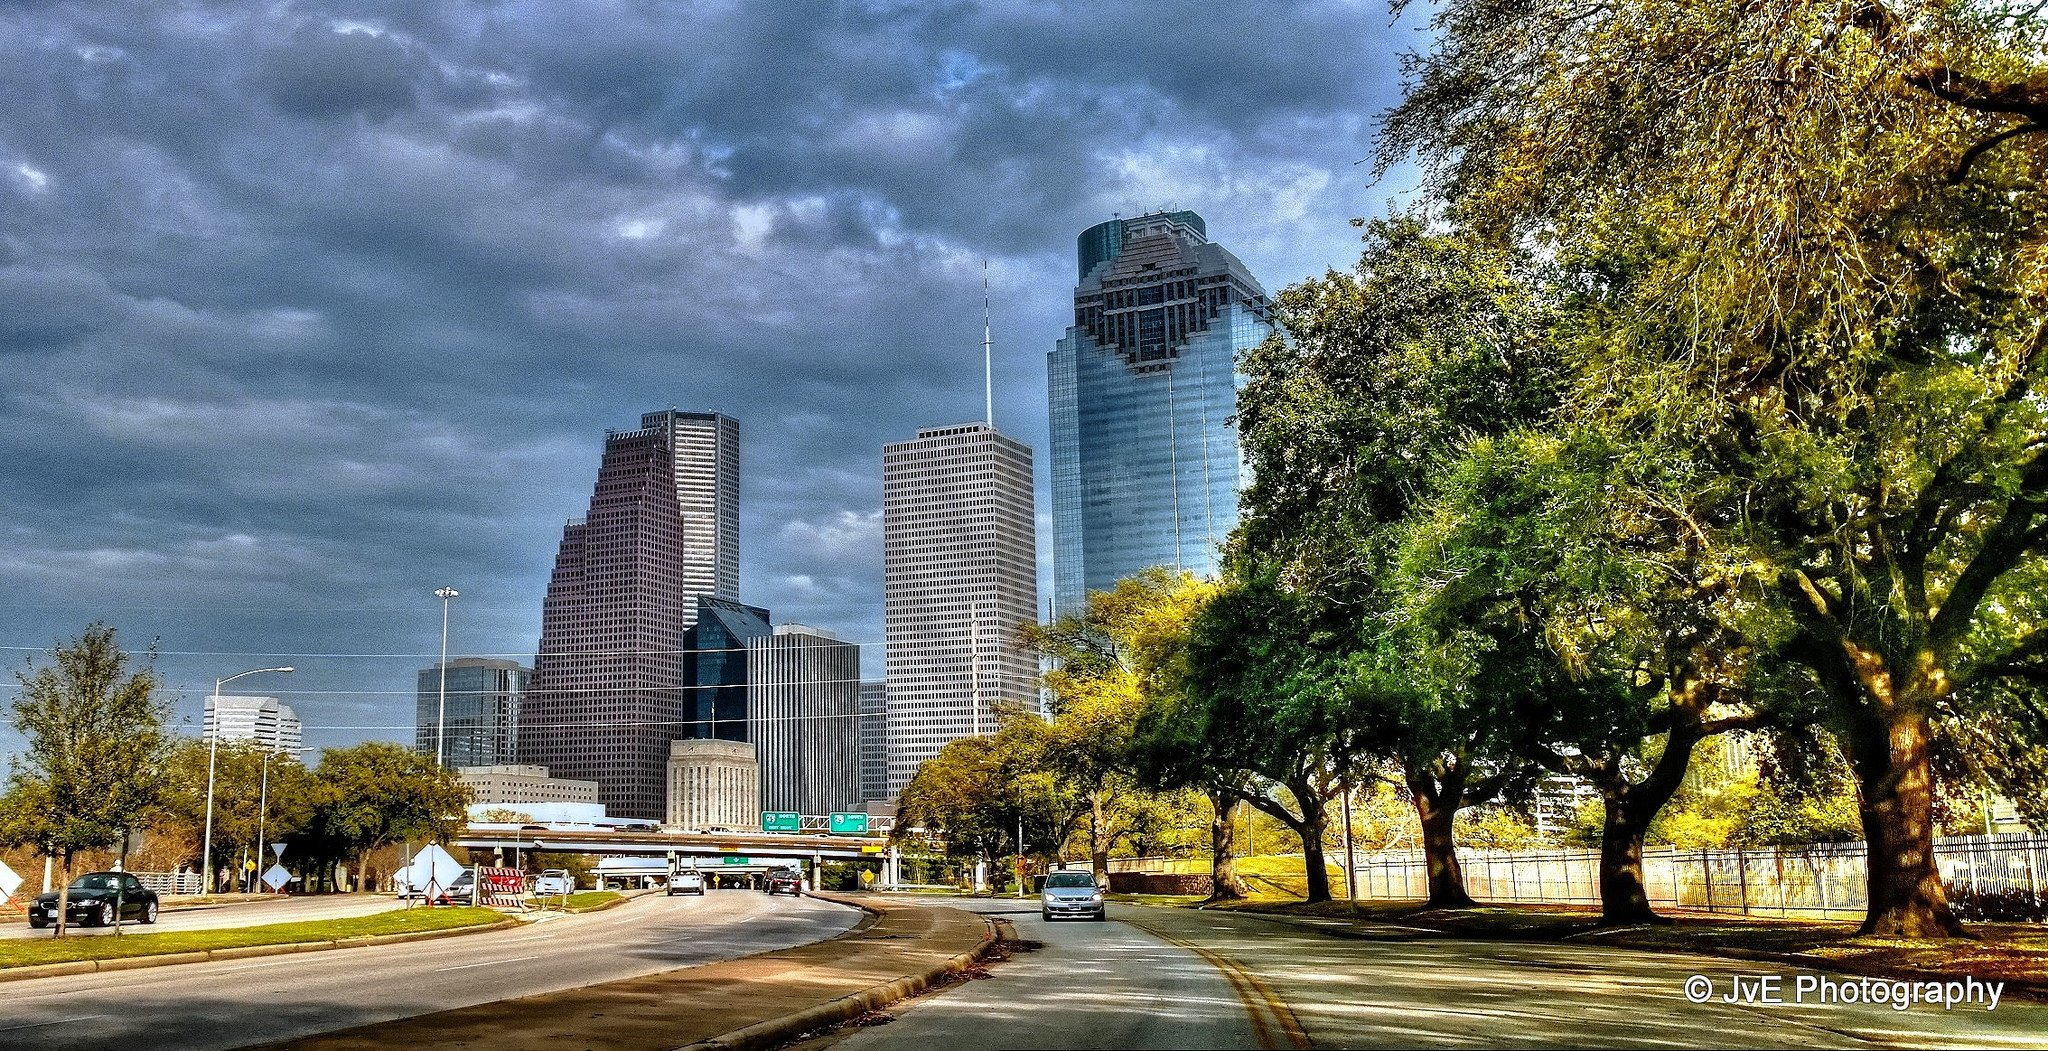 Houston architecture bridges cities City texas Night towers buildings 2048x1051